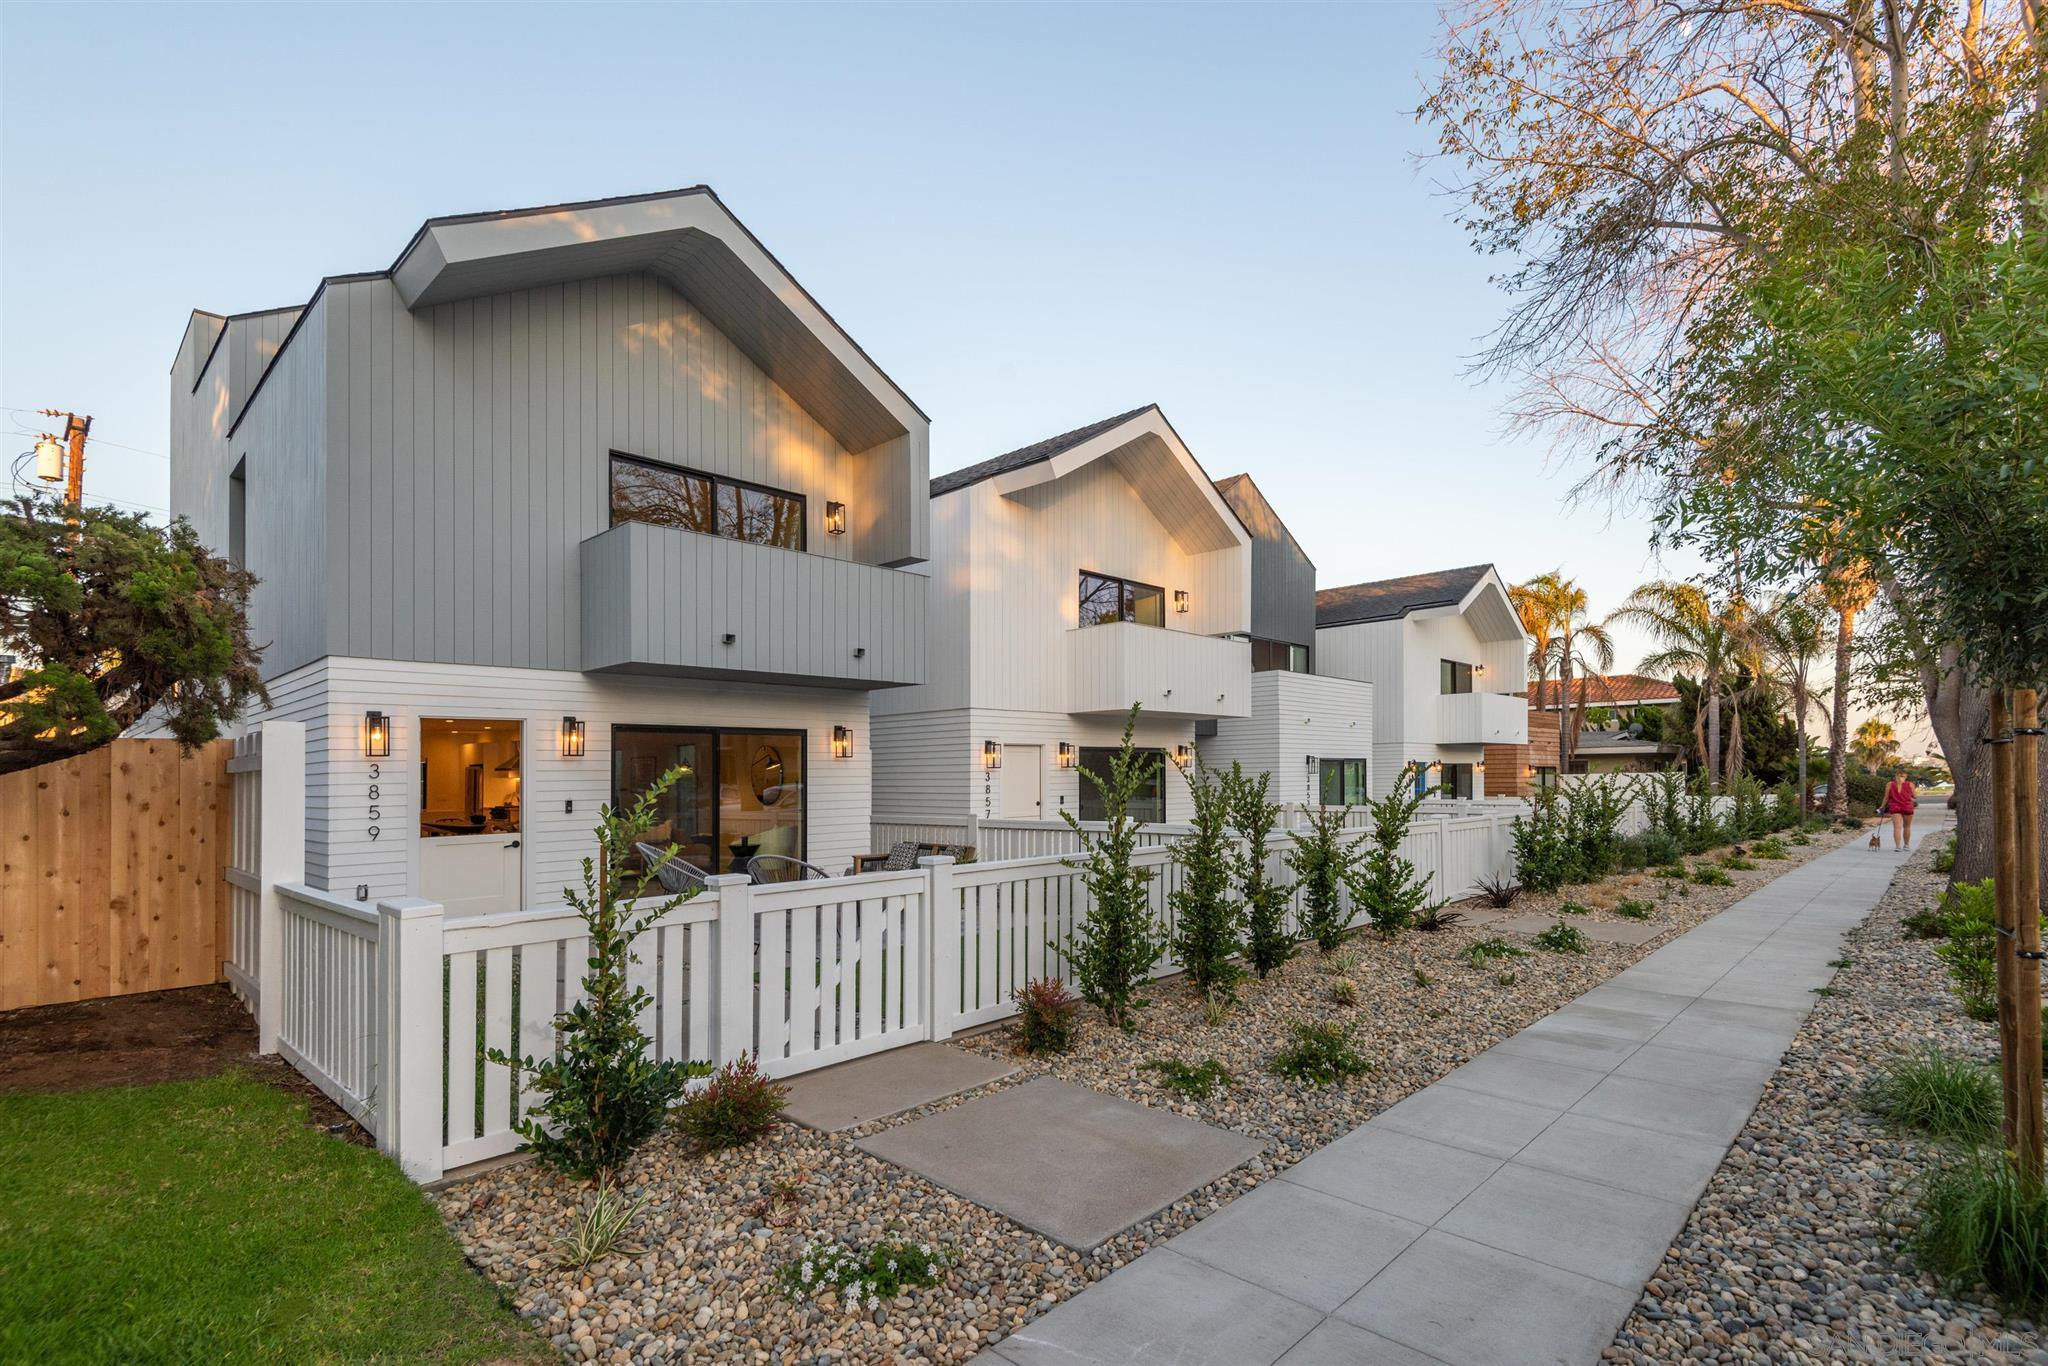 3859 Sequoia St., San Diego, CA 92109